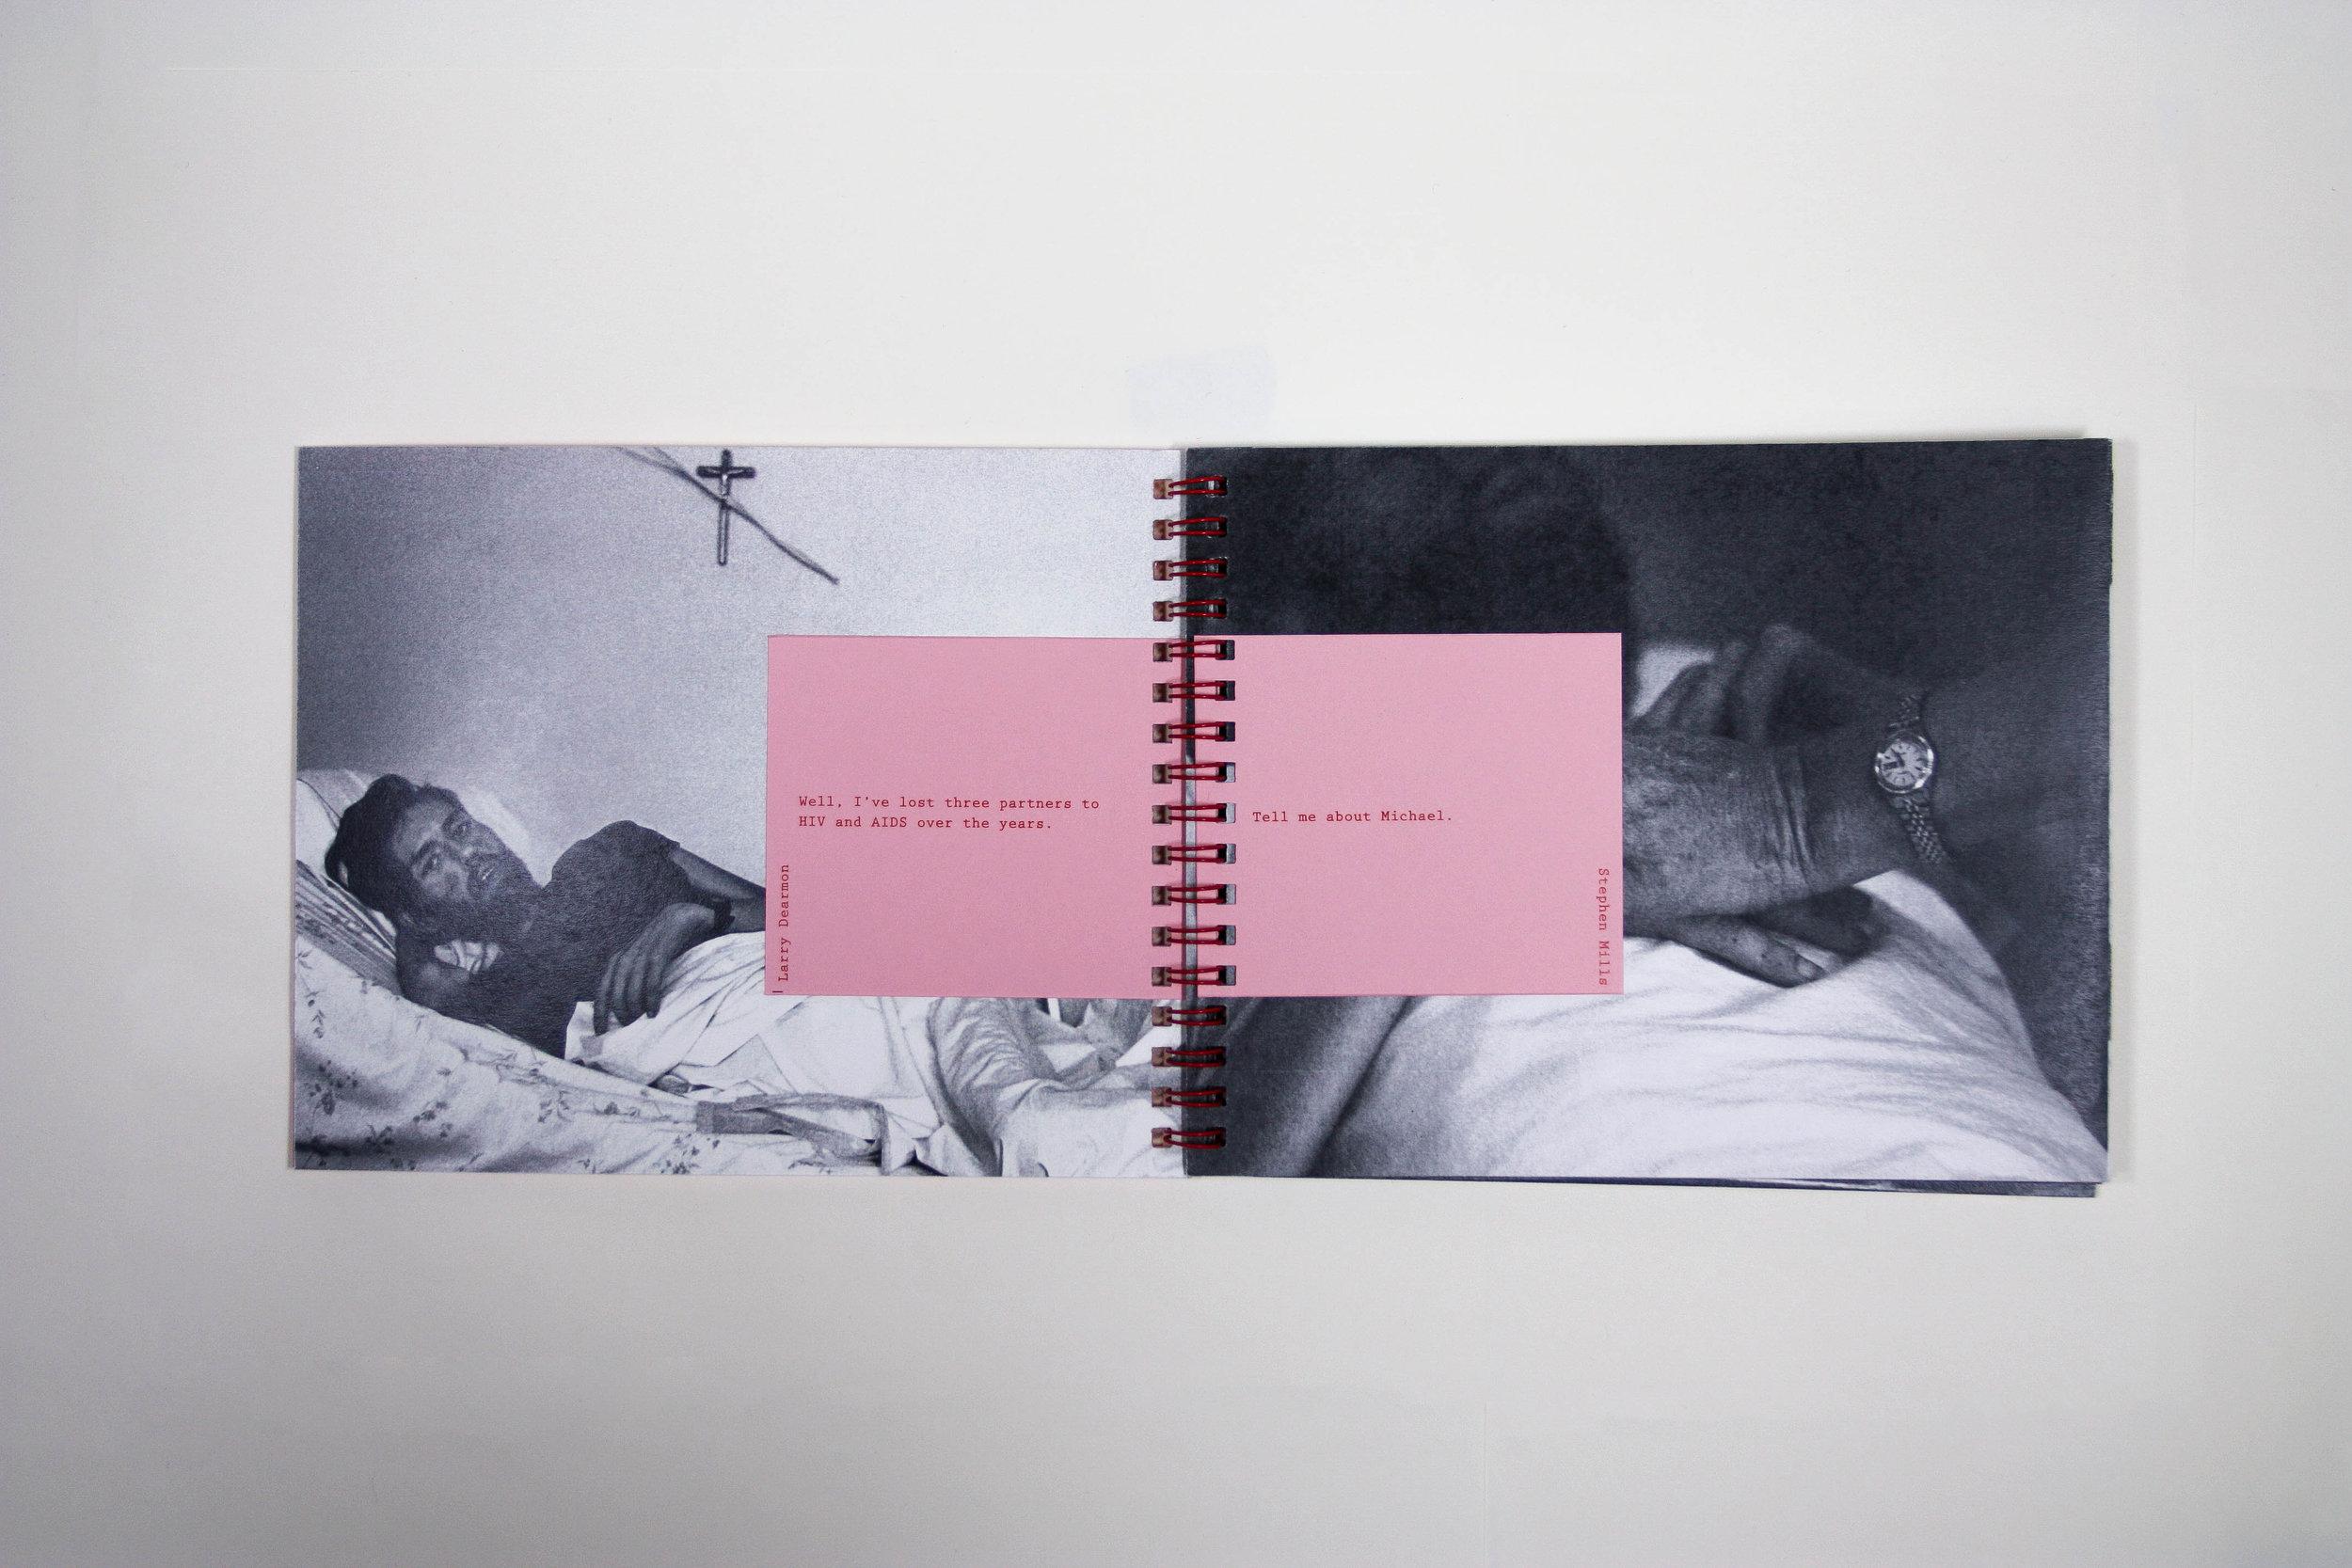 estory-bookimages-4.jpg